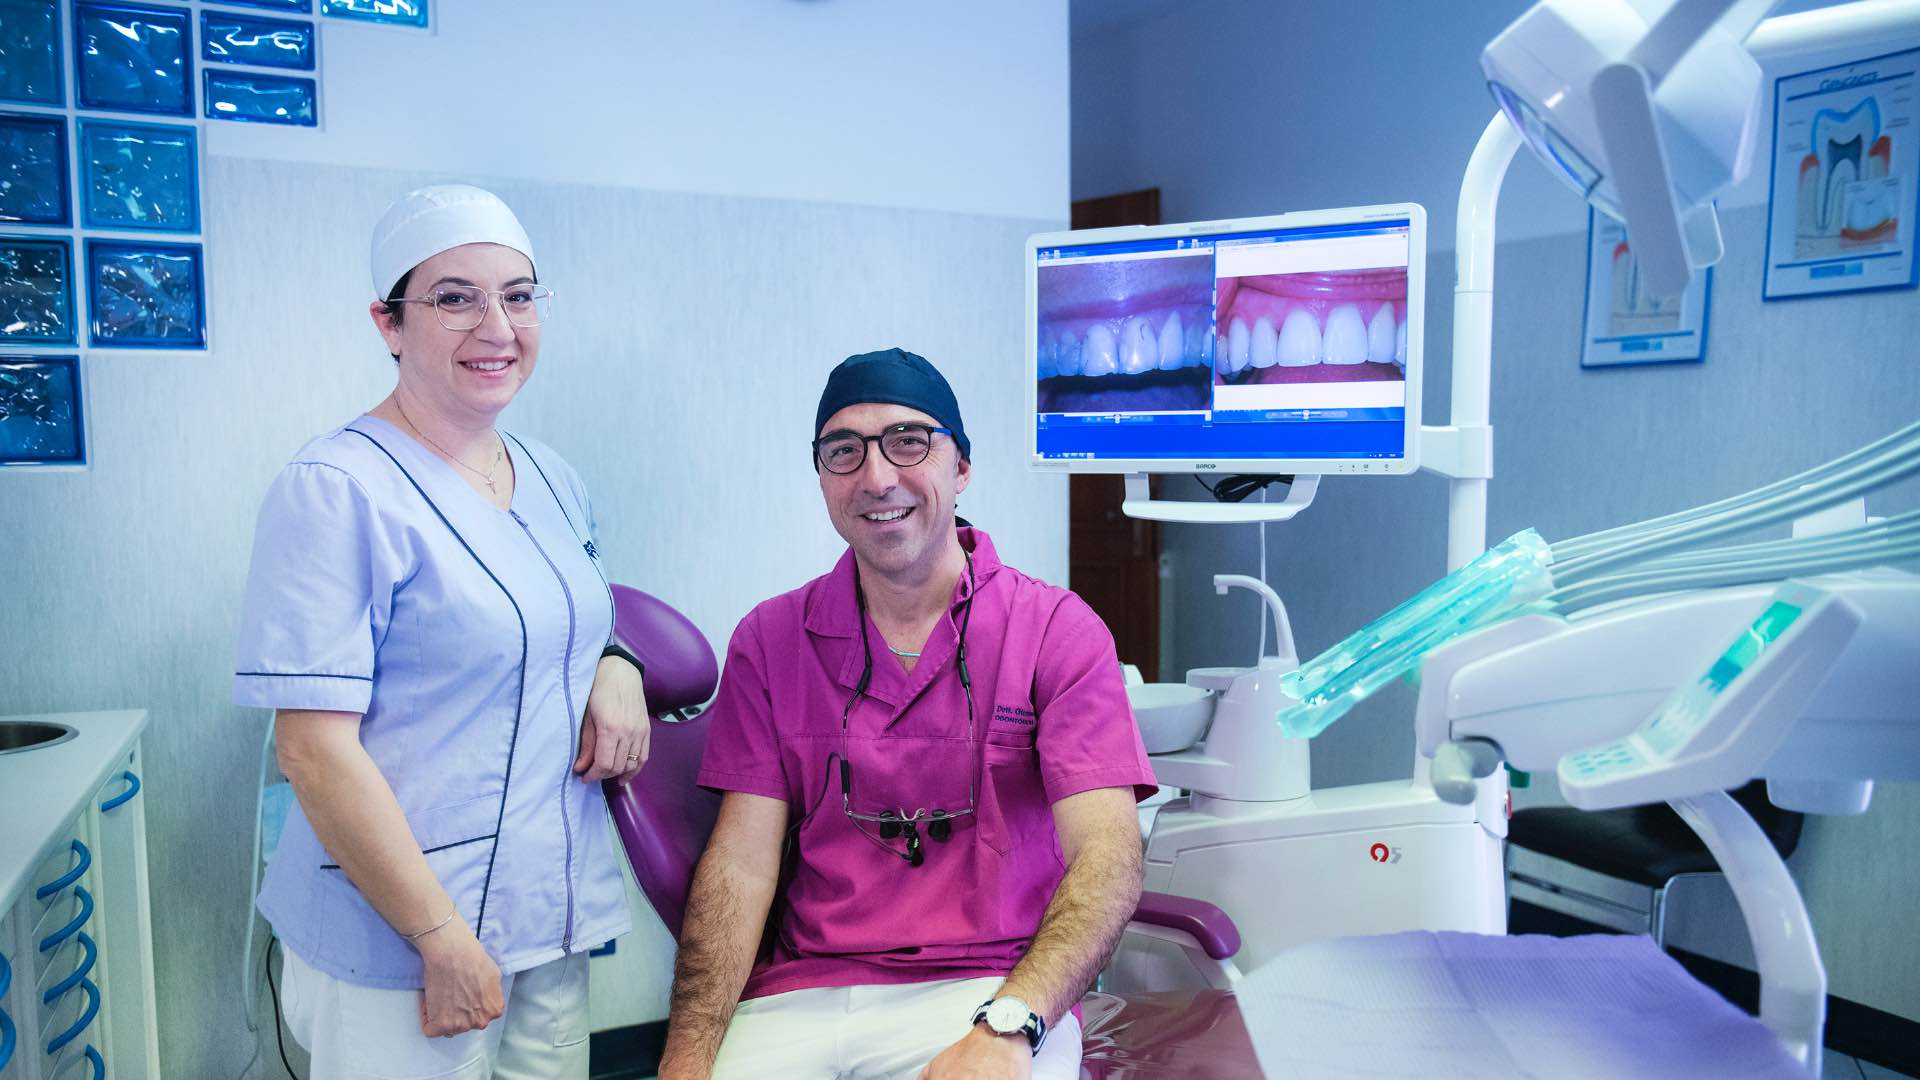 Studio dentistico Spinosa 34 | Dentista a Gaeta